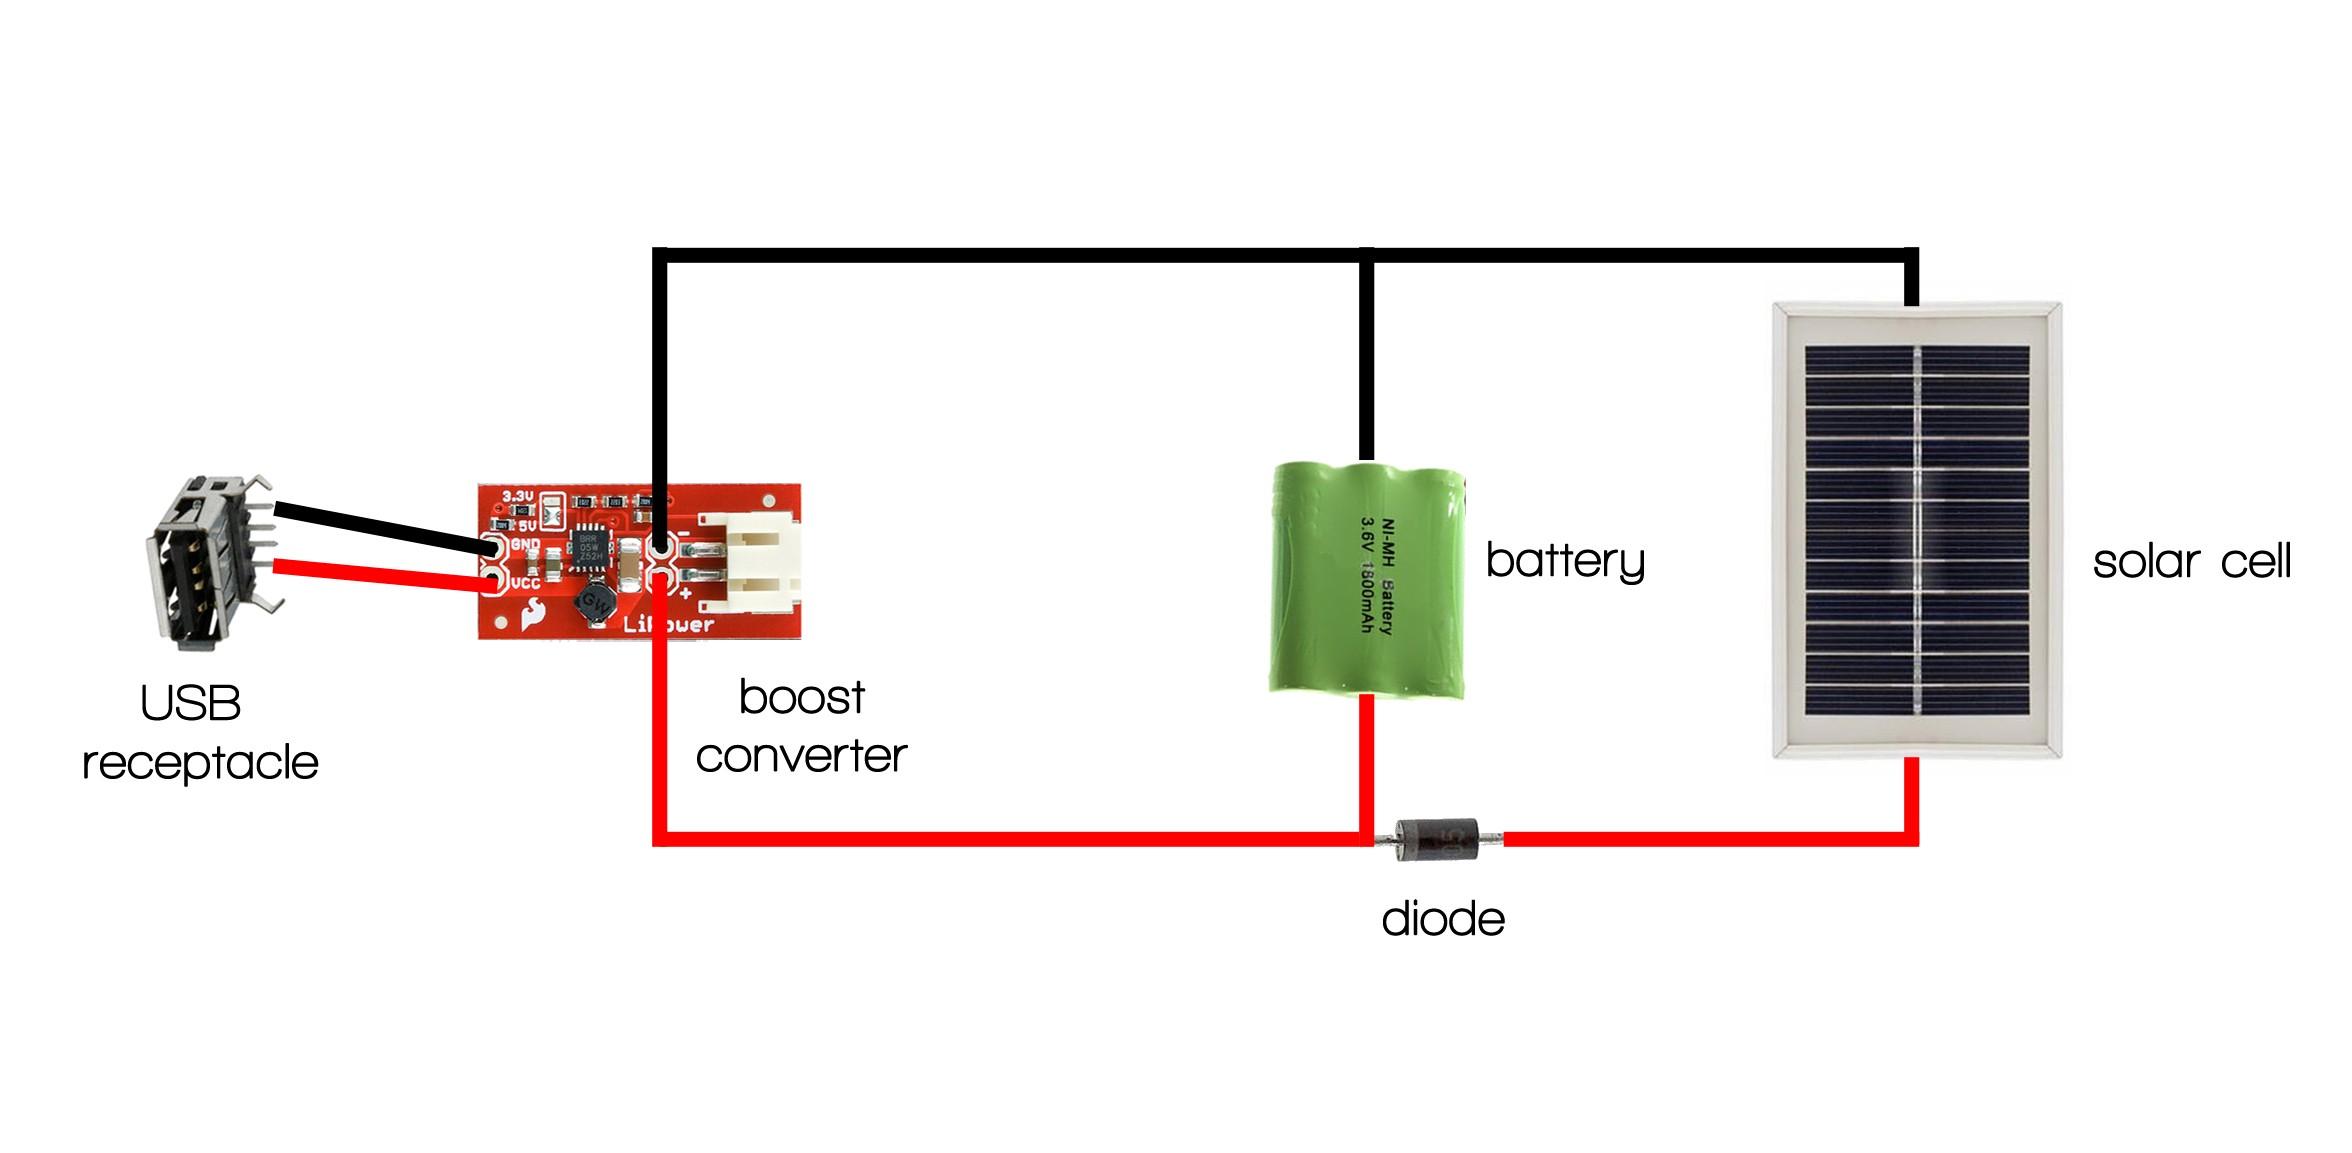 Solar Usb Charger Design For Diy Manufacturing Prototype Building electrical diagram software fet diagram